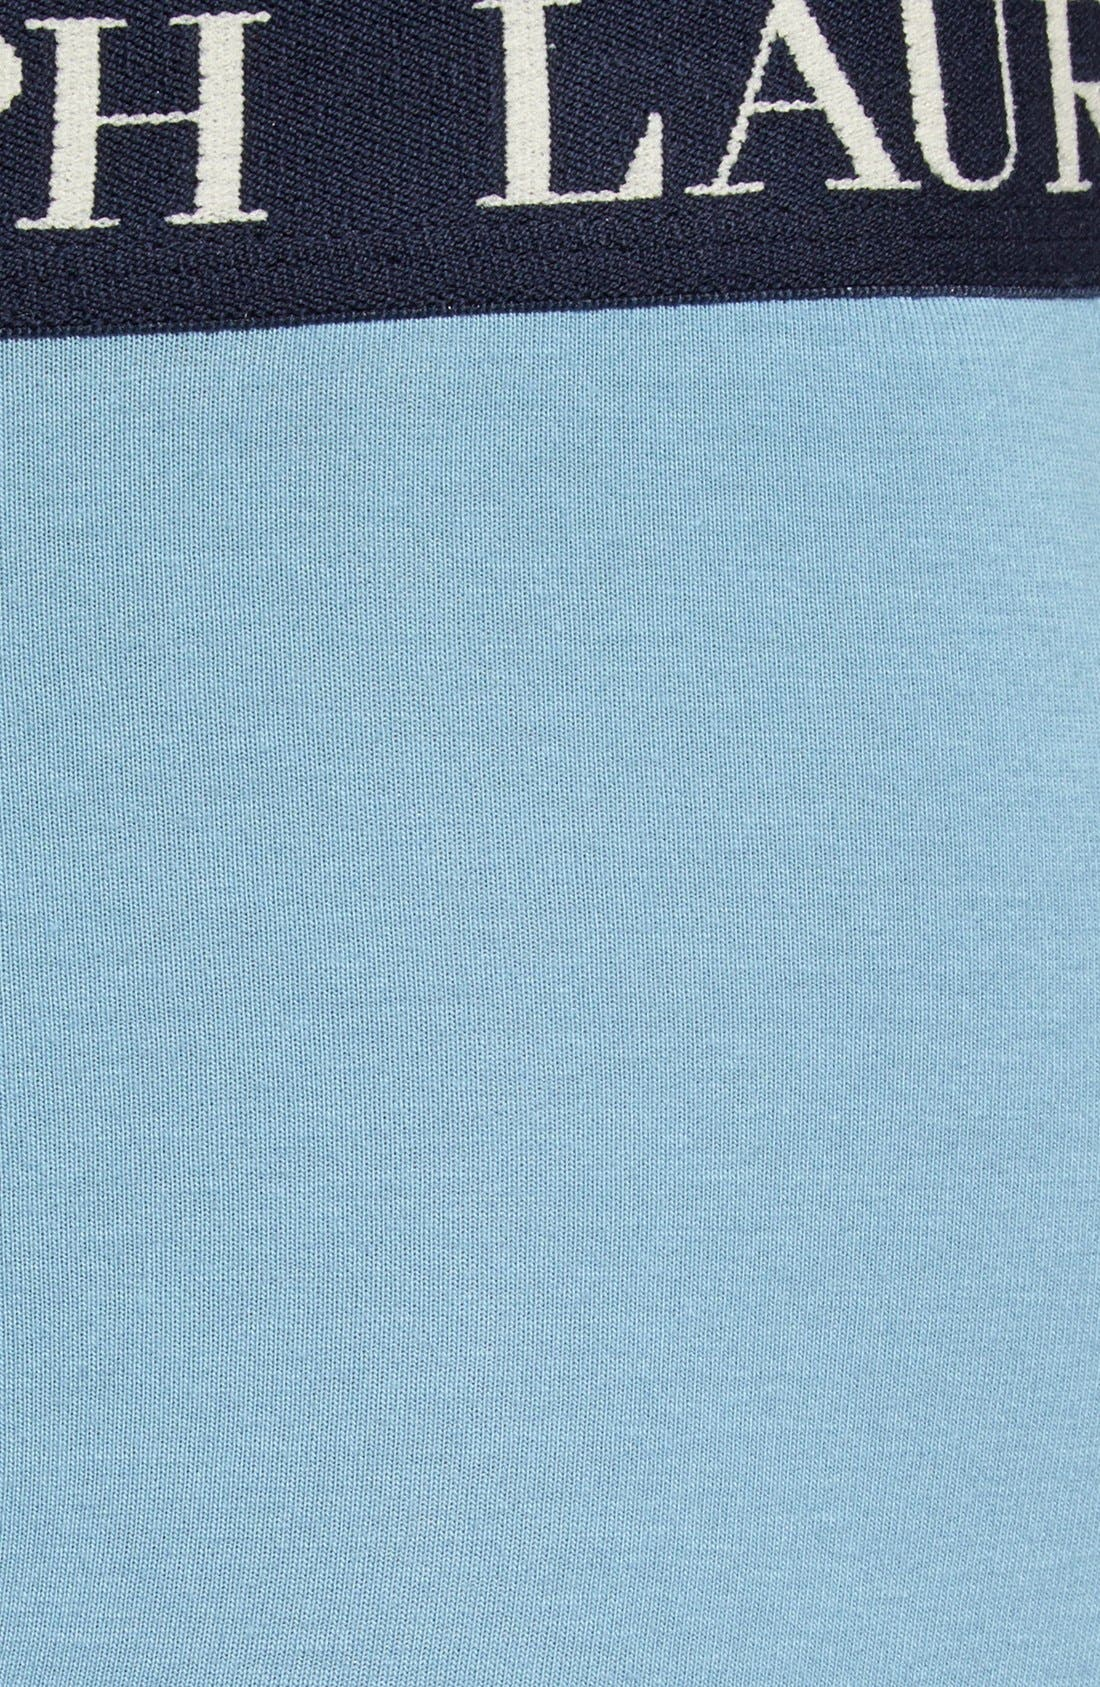 Alternate Image 3  - Polo Ralph Lauren Stretch Cotton Boxer Briefs